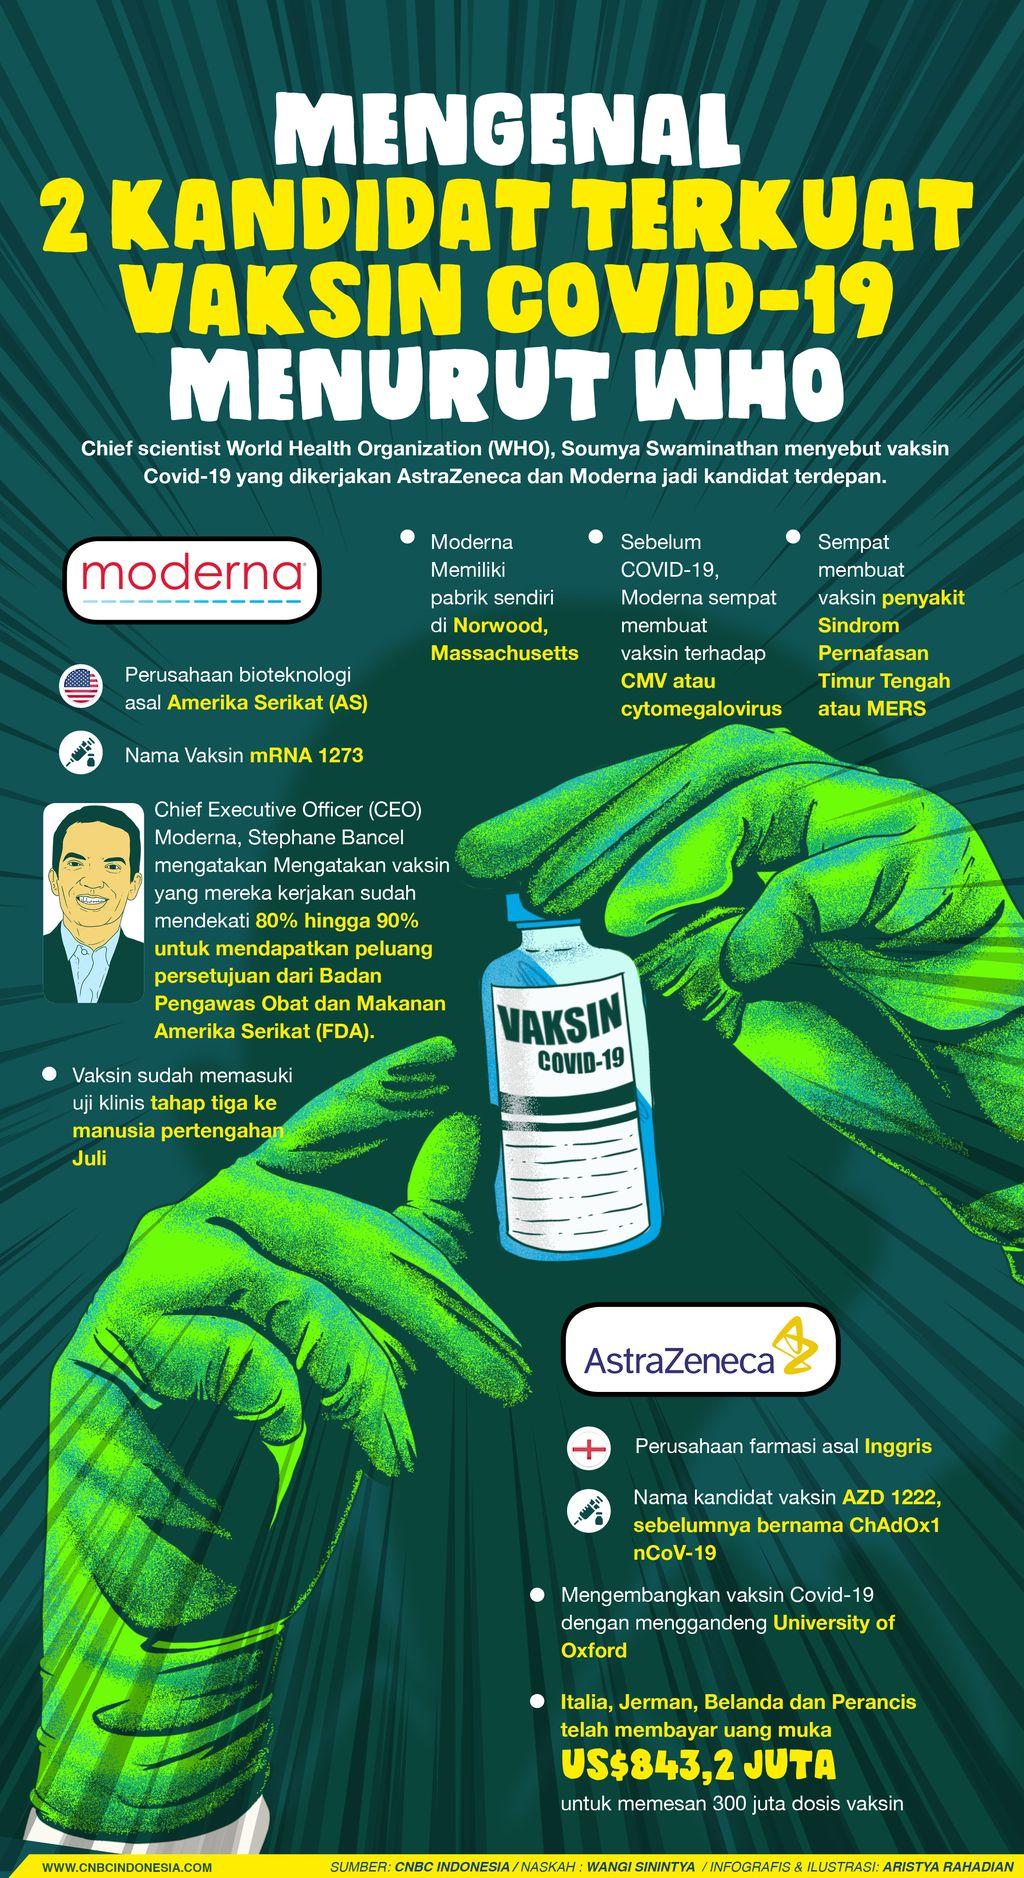 Infografis/Mengenal 2 Kandidat Terkuat Vaksin Covid-19 Menurut WHO/Aristya Rahadian